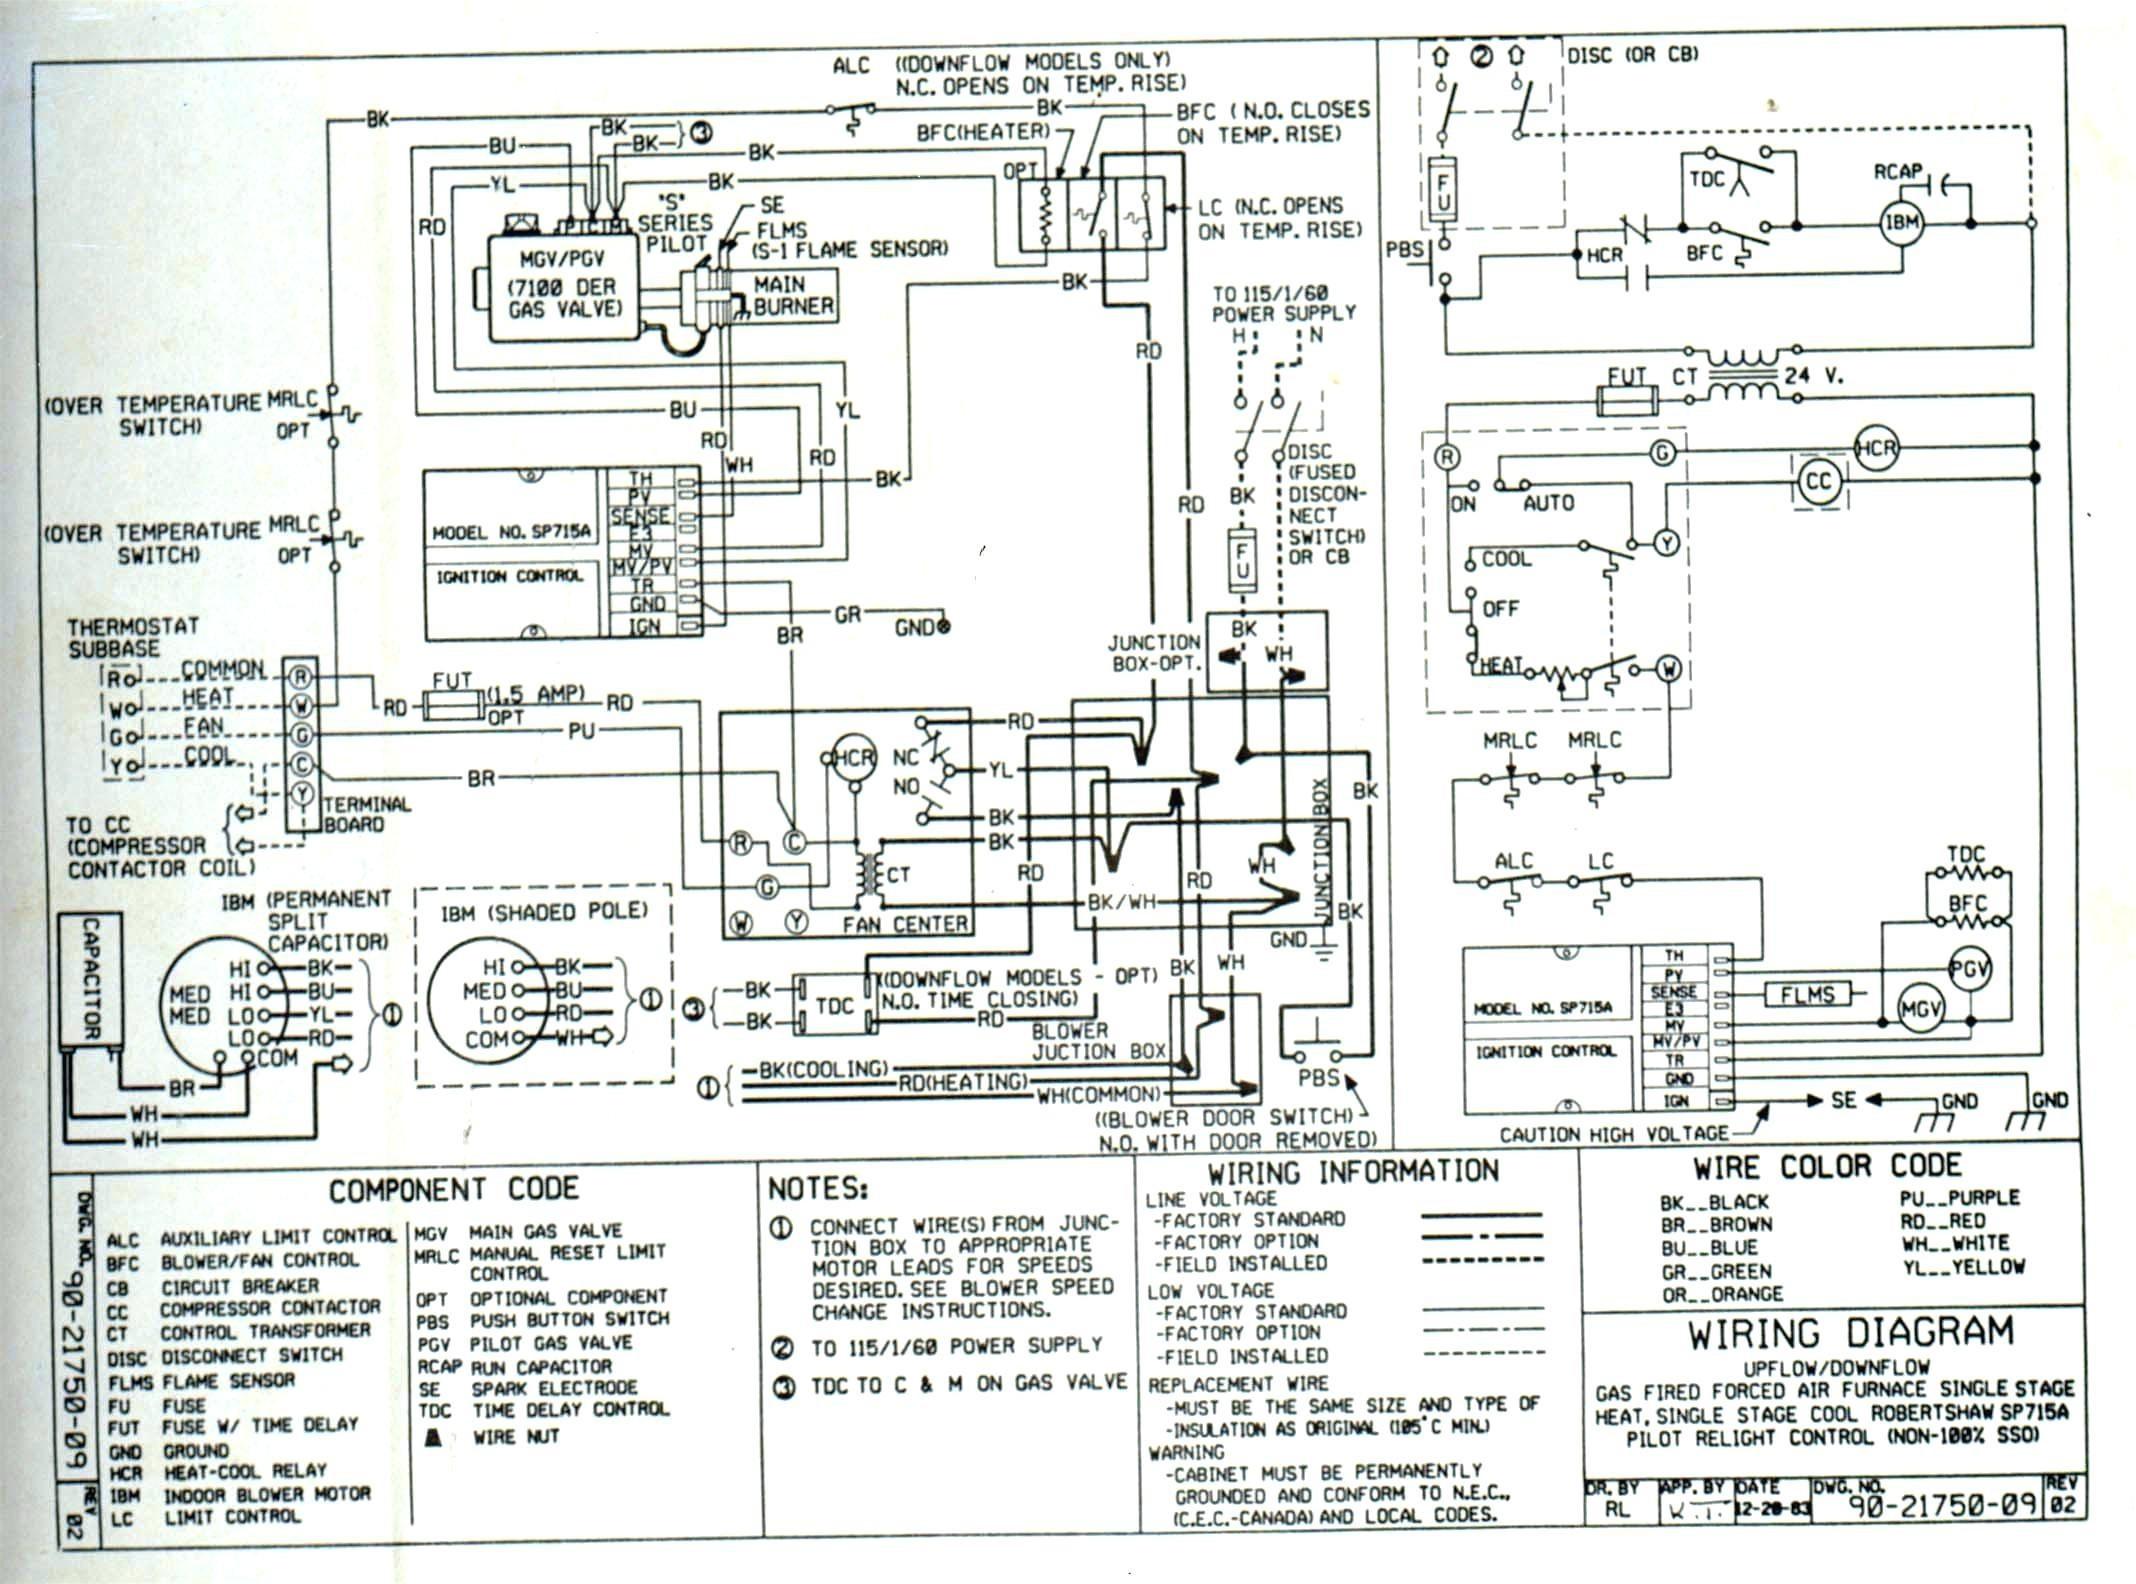 trane wiring diagram Collection Trane thermostat Wiring Diagram Luxury Wiring Diagram for Trane Xe1000 Wiring